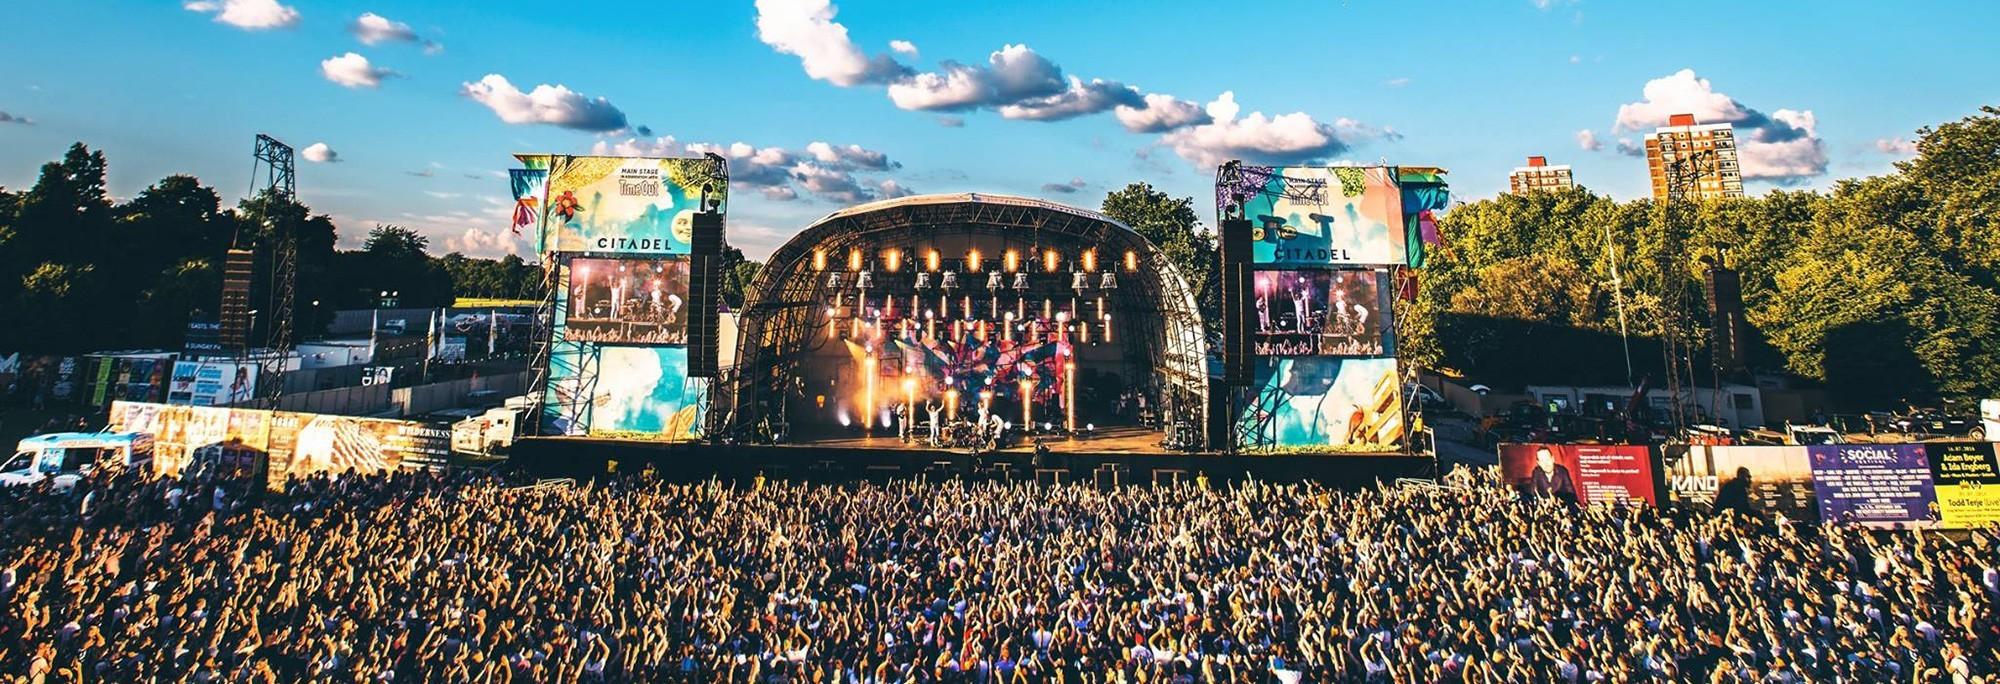 Citadel Festival - Victoria Park, London